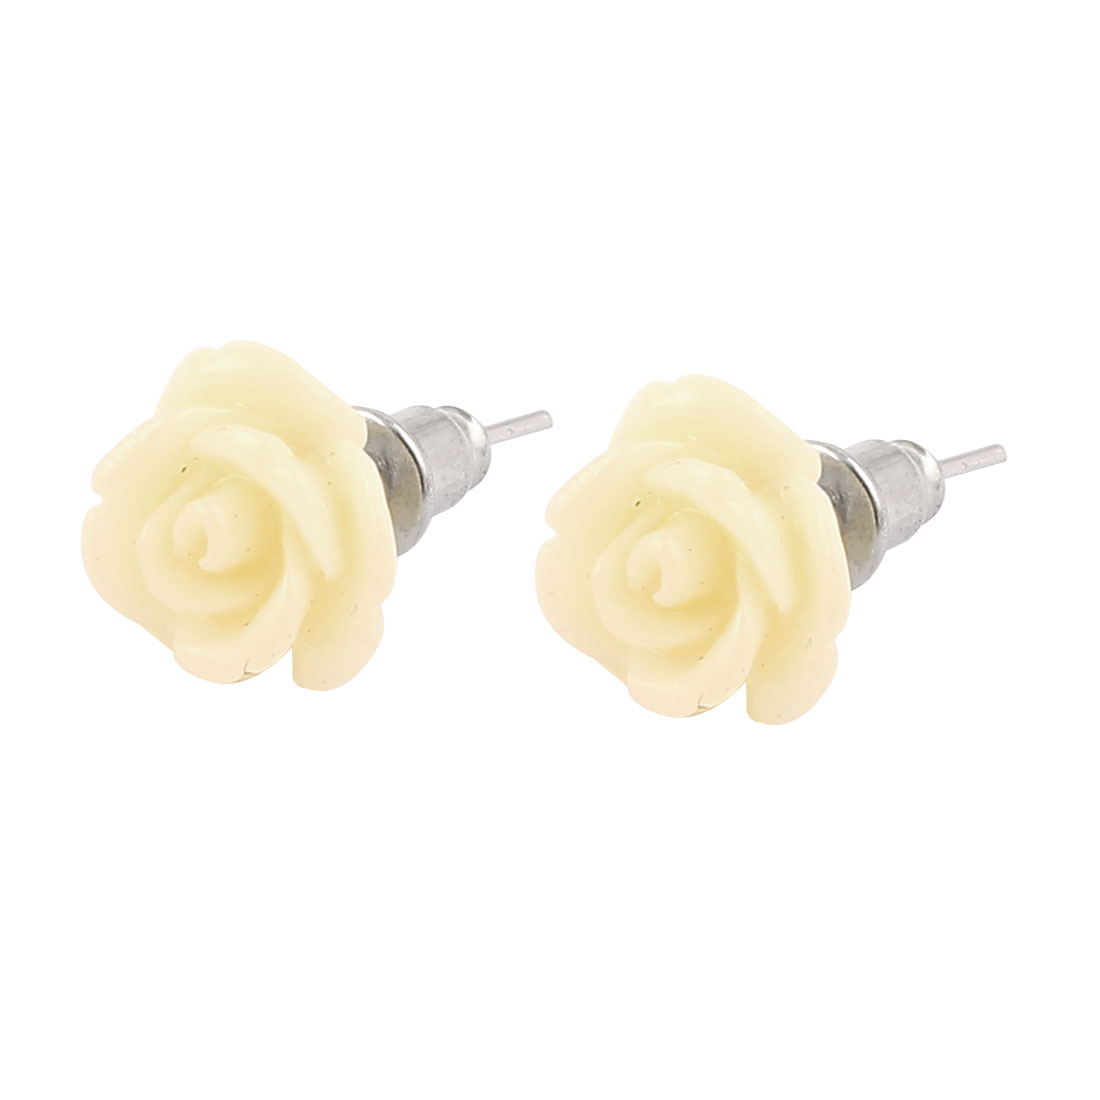 2cm Length Silver Tone Light Yellow Plastic Flower Shape Pierced Metal Stud Pin Ear Nail Earrings Earbobs Pair for Lady Women